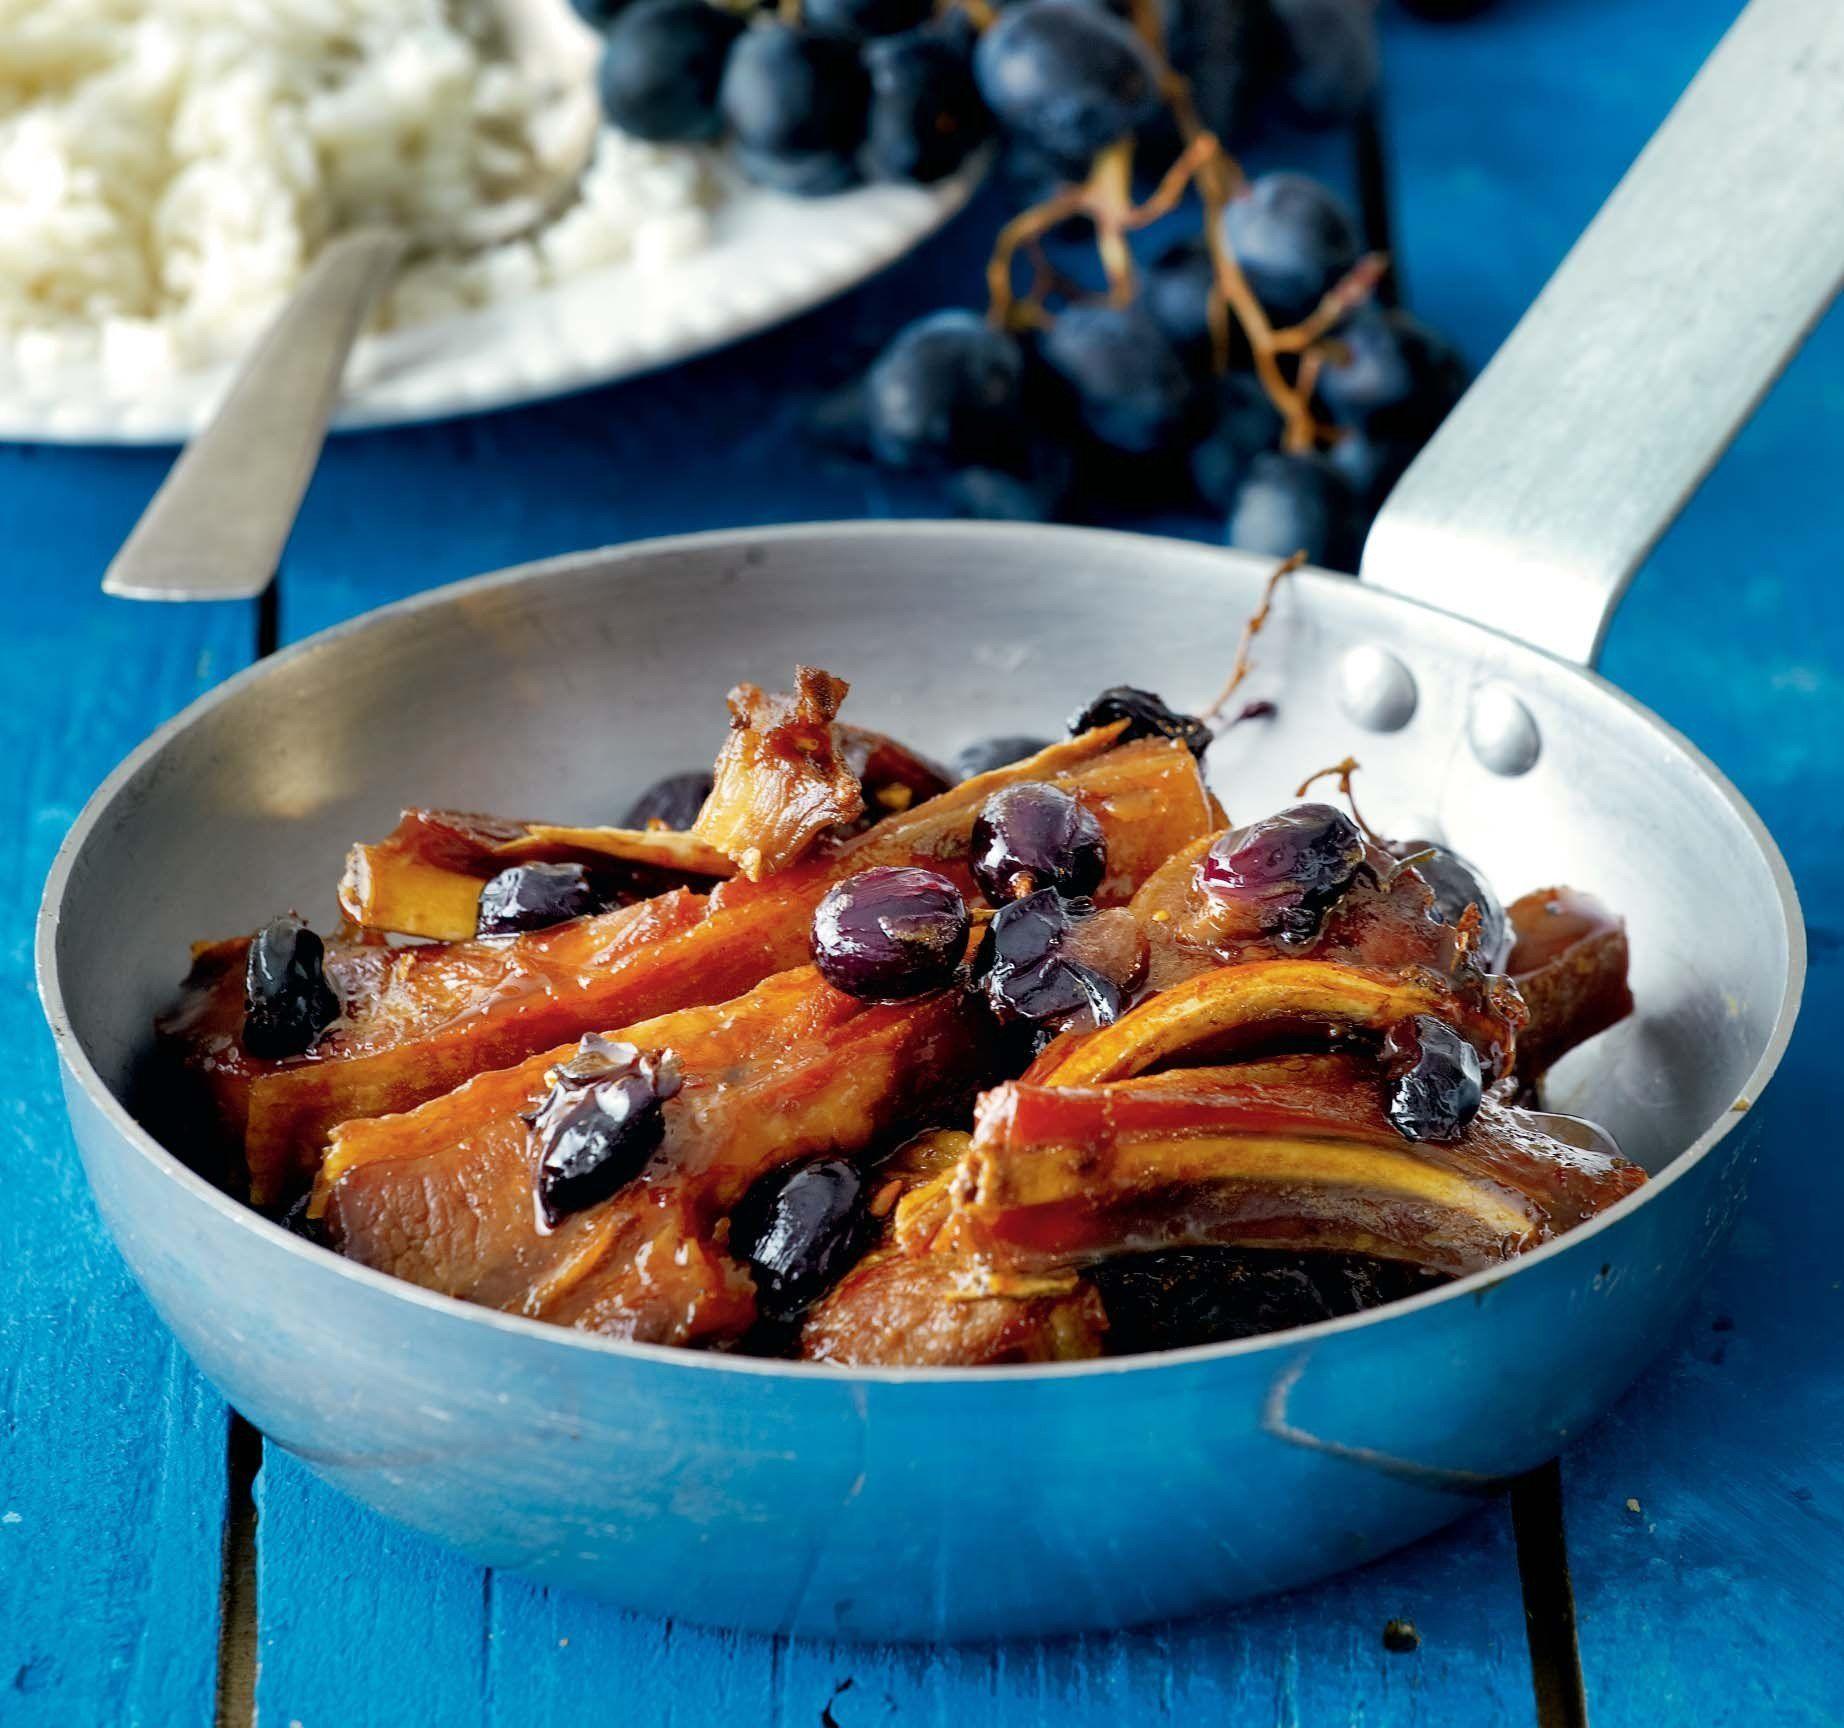 80+ Greek Recipes - The best Greek food and desserts images | συνταγές, ψωμί με μαγιά, συνταγές για ψητά